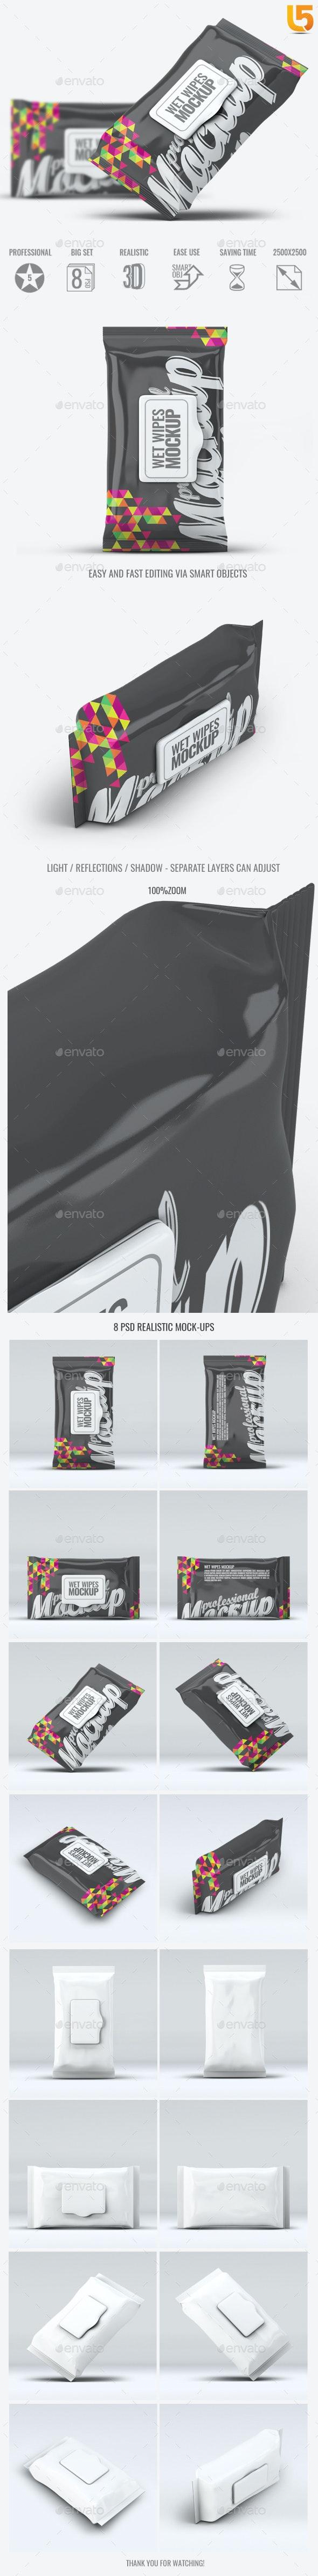 Wet Wipes Mock-Up - Beauty Packaging